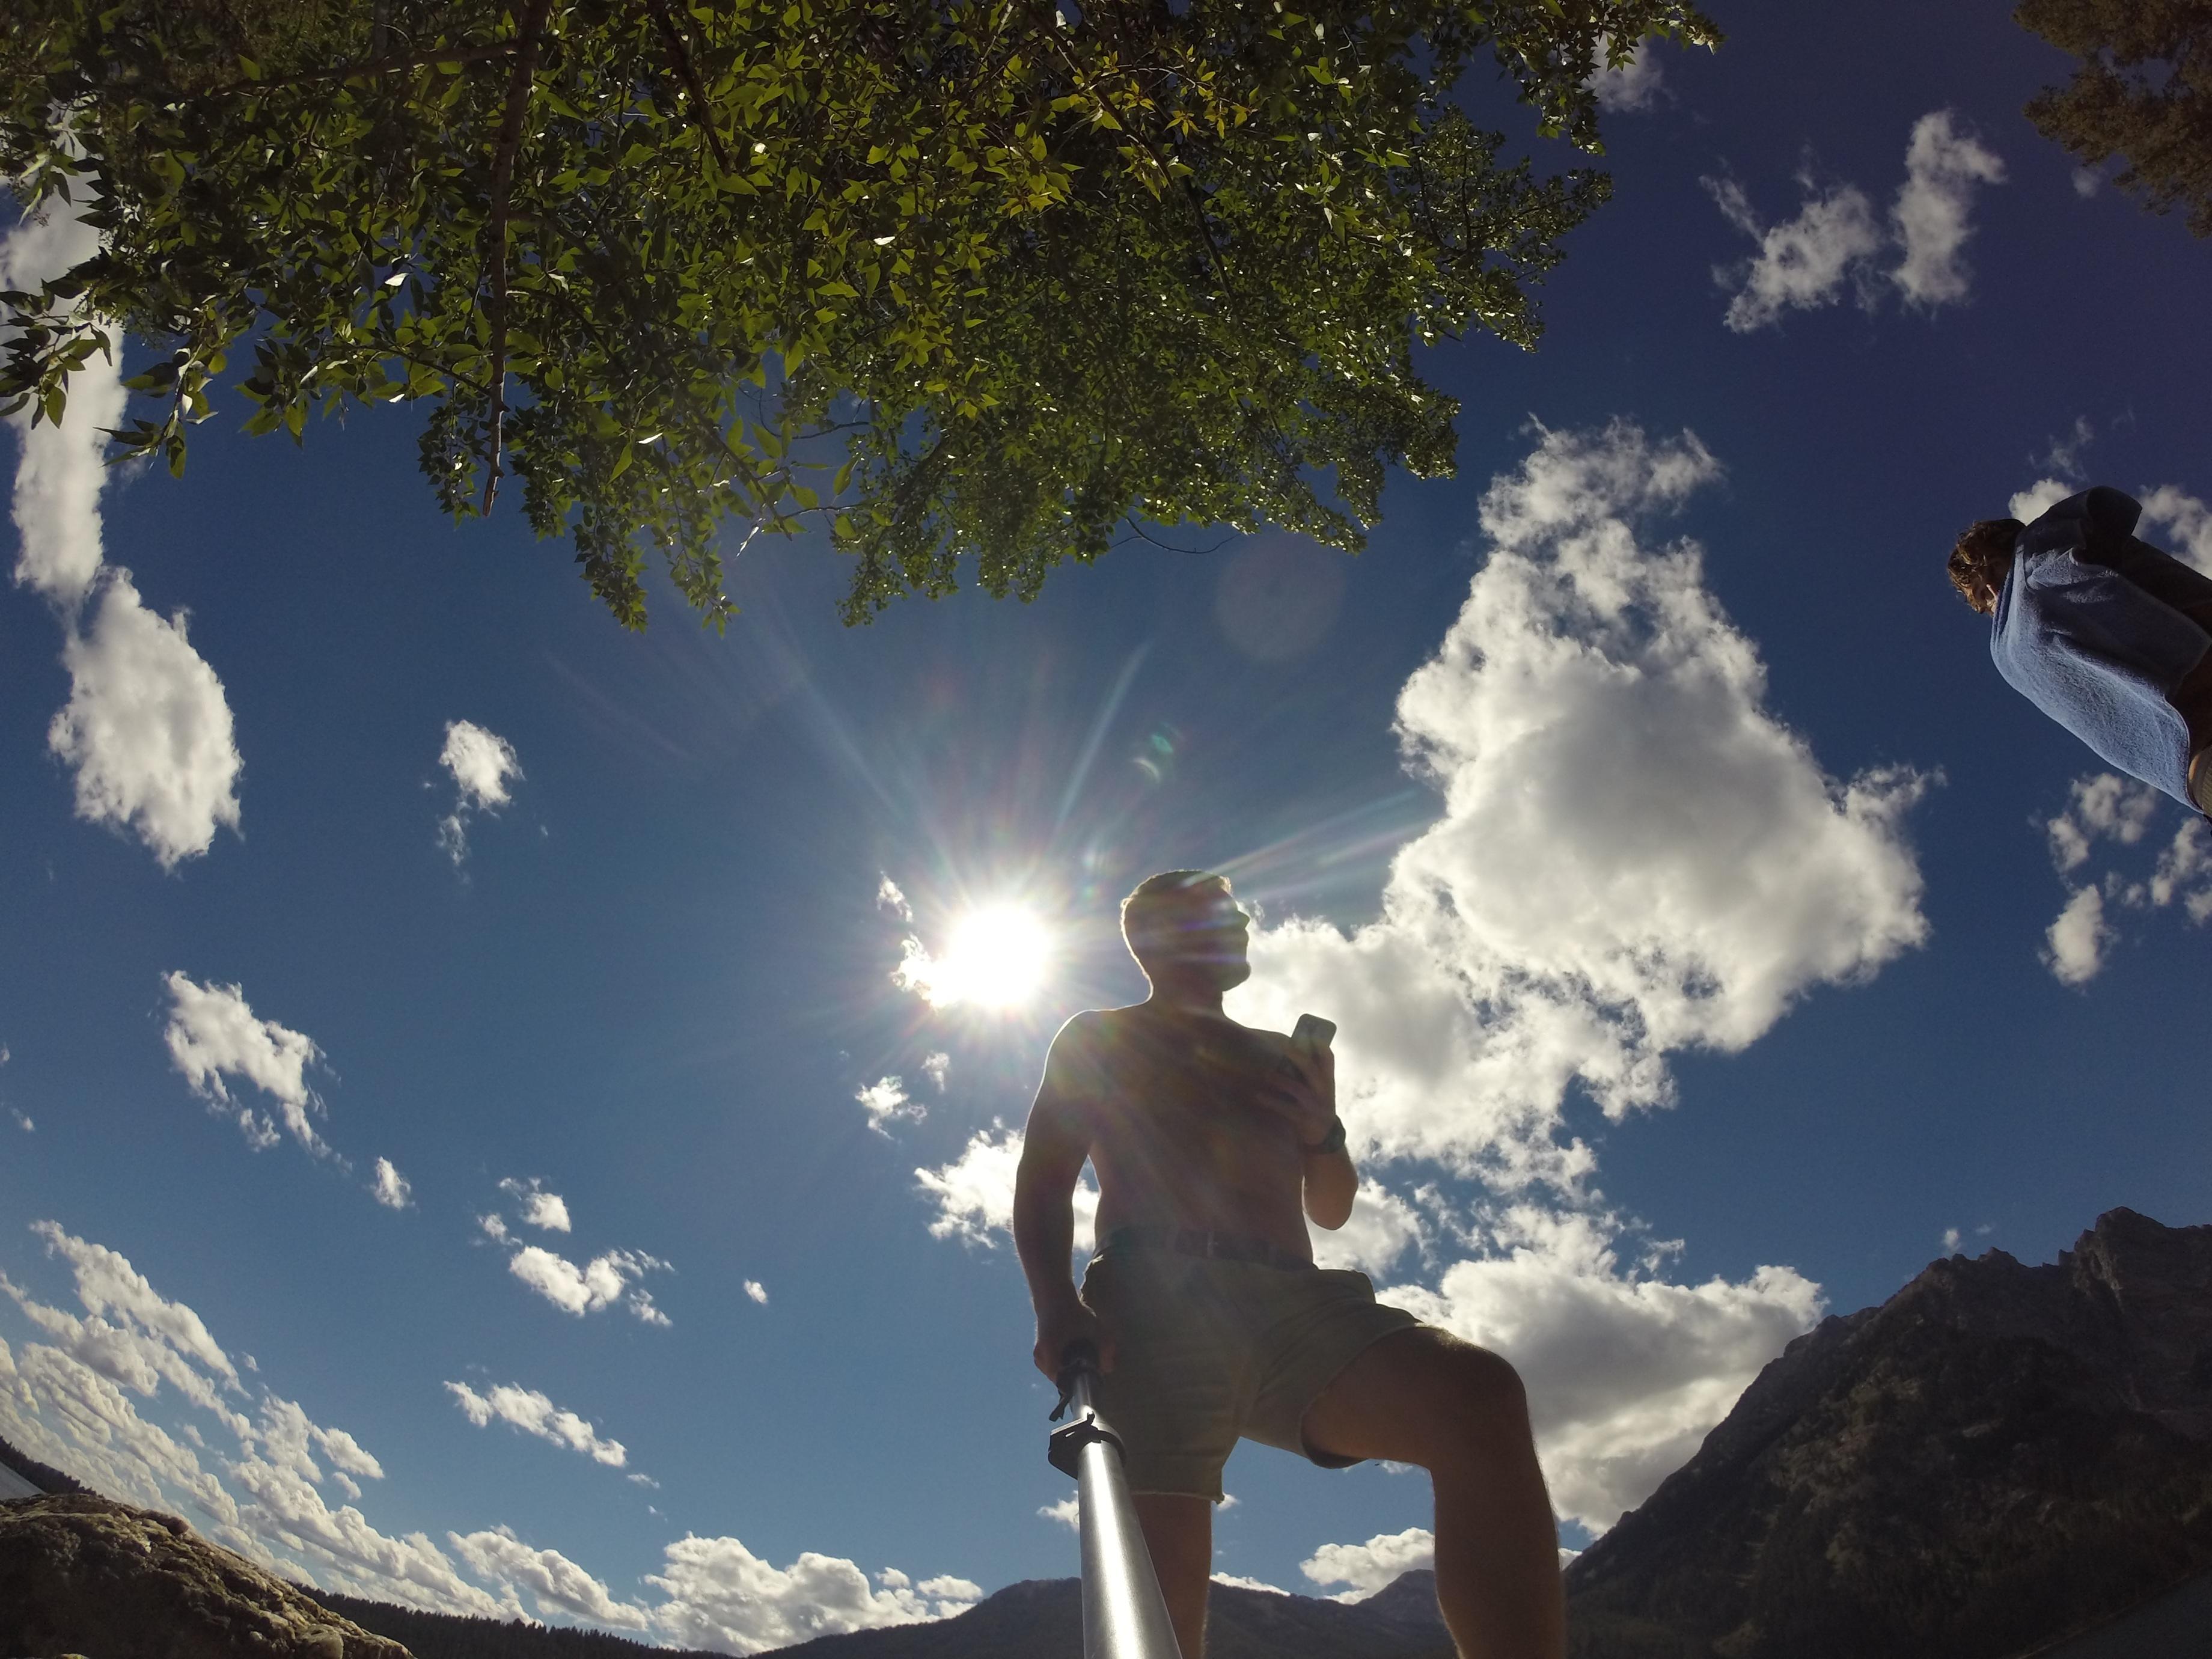 Смотрящий в небо фото